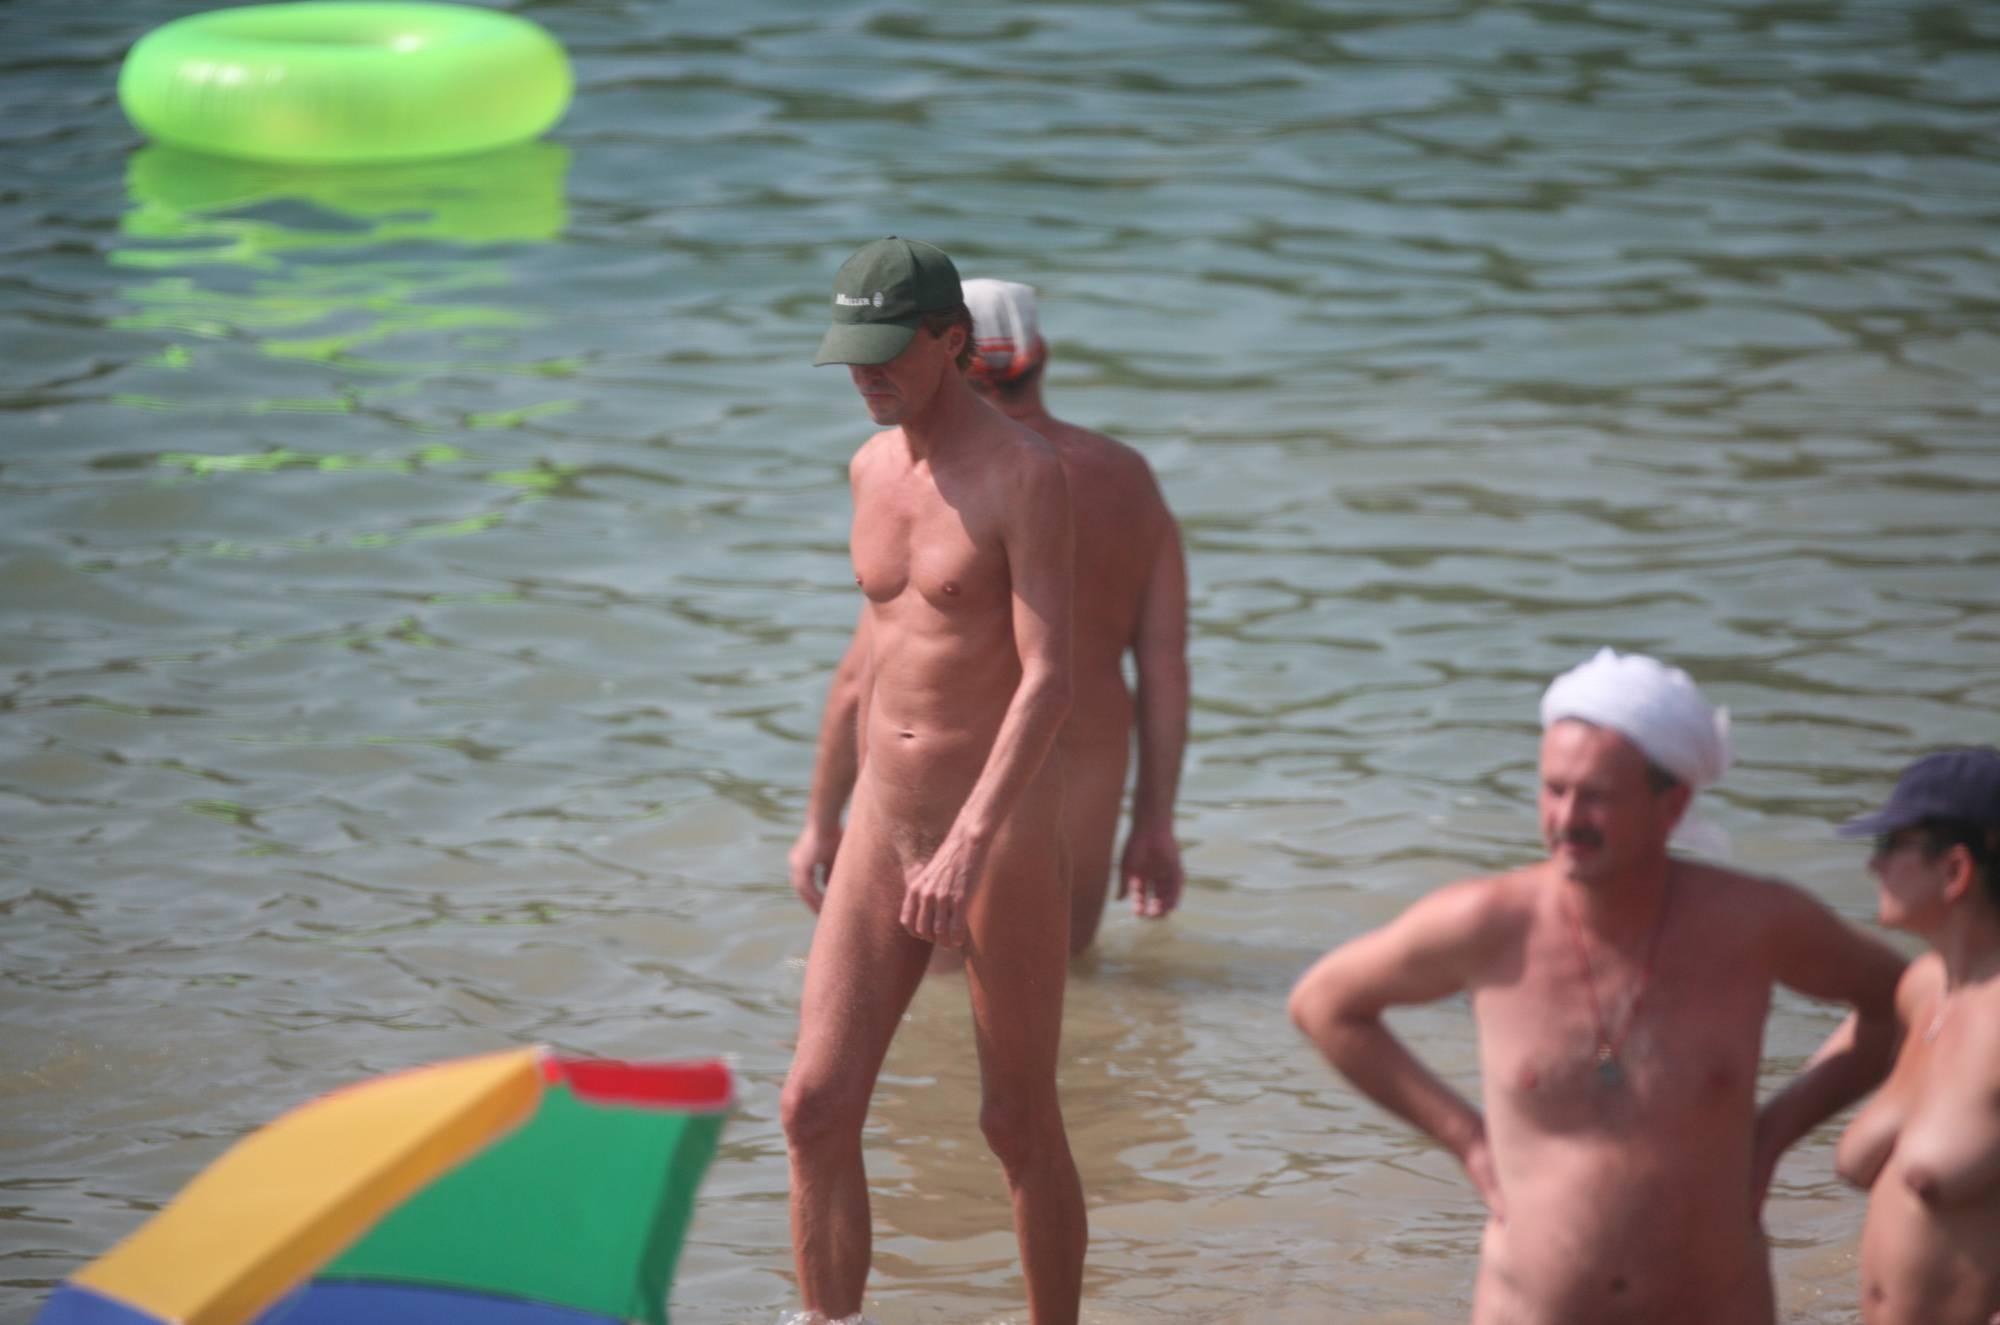 Nudist Photos Wolin Beach Zoom - 1